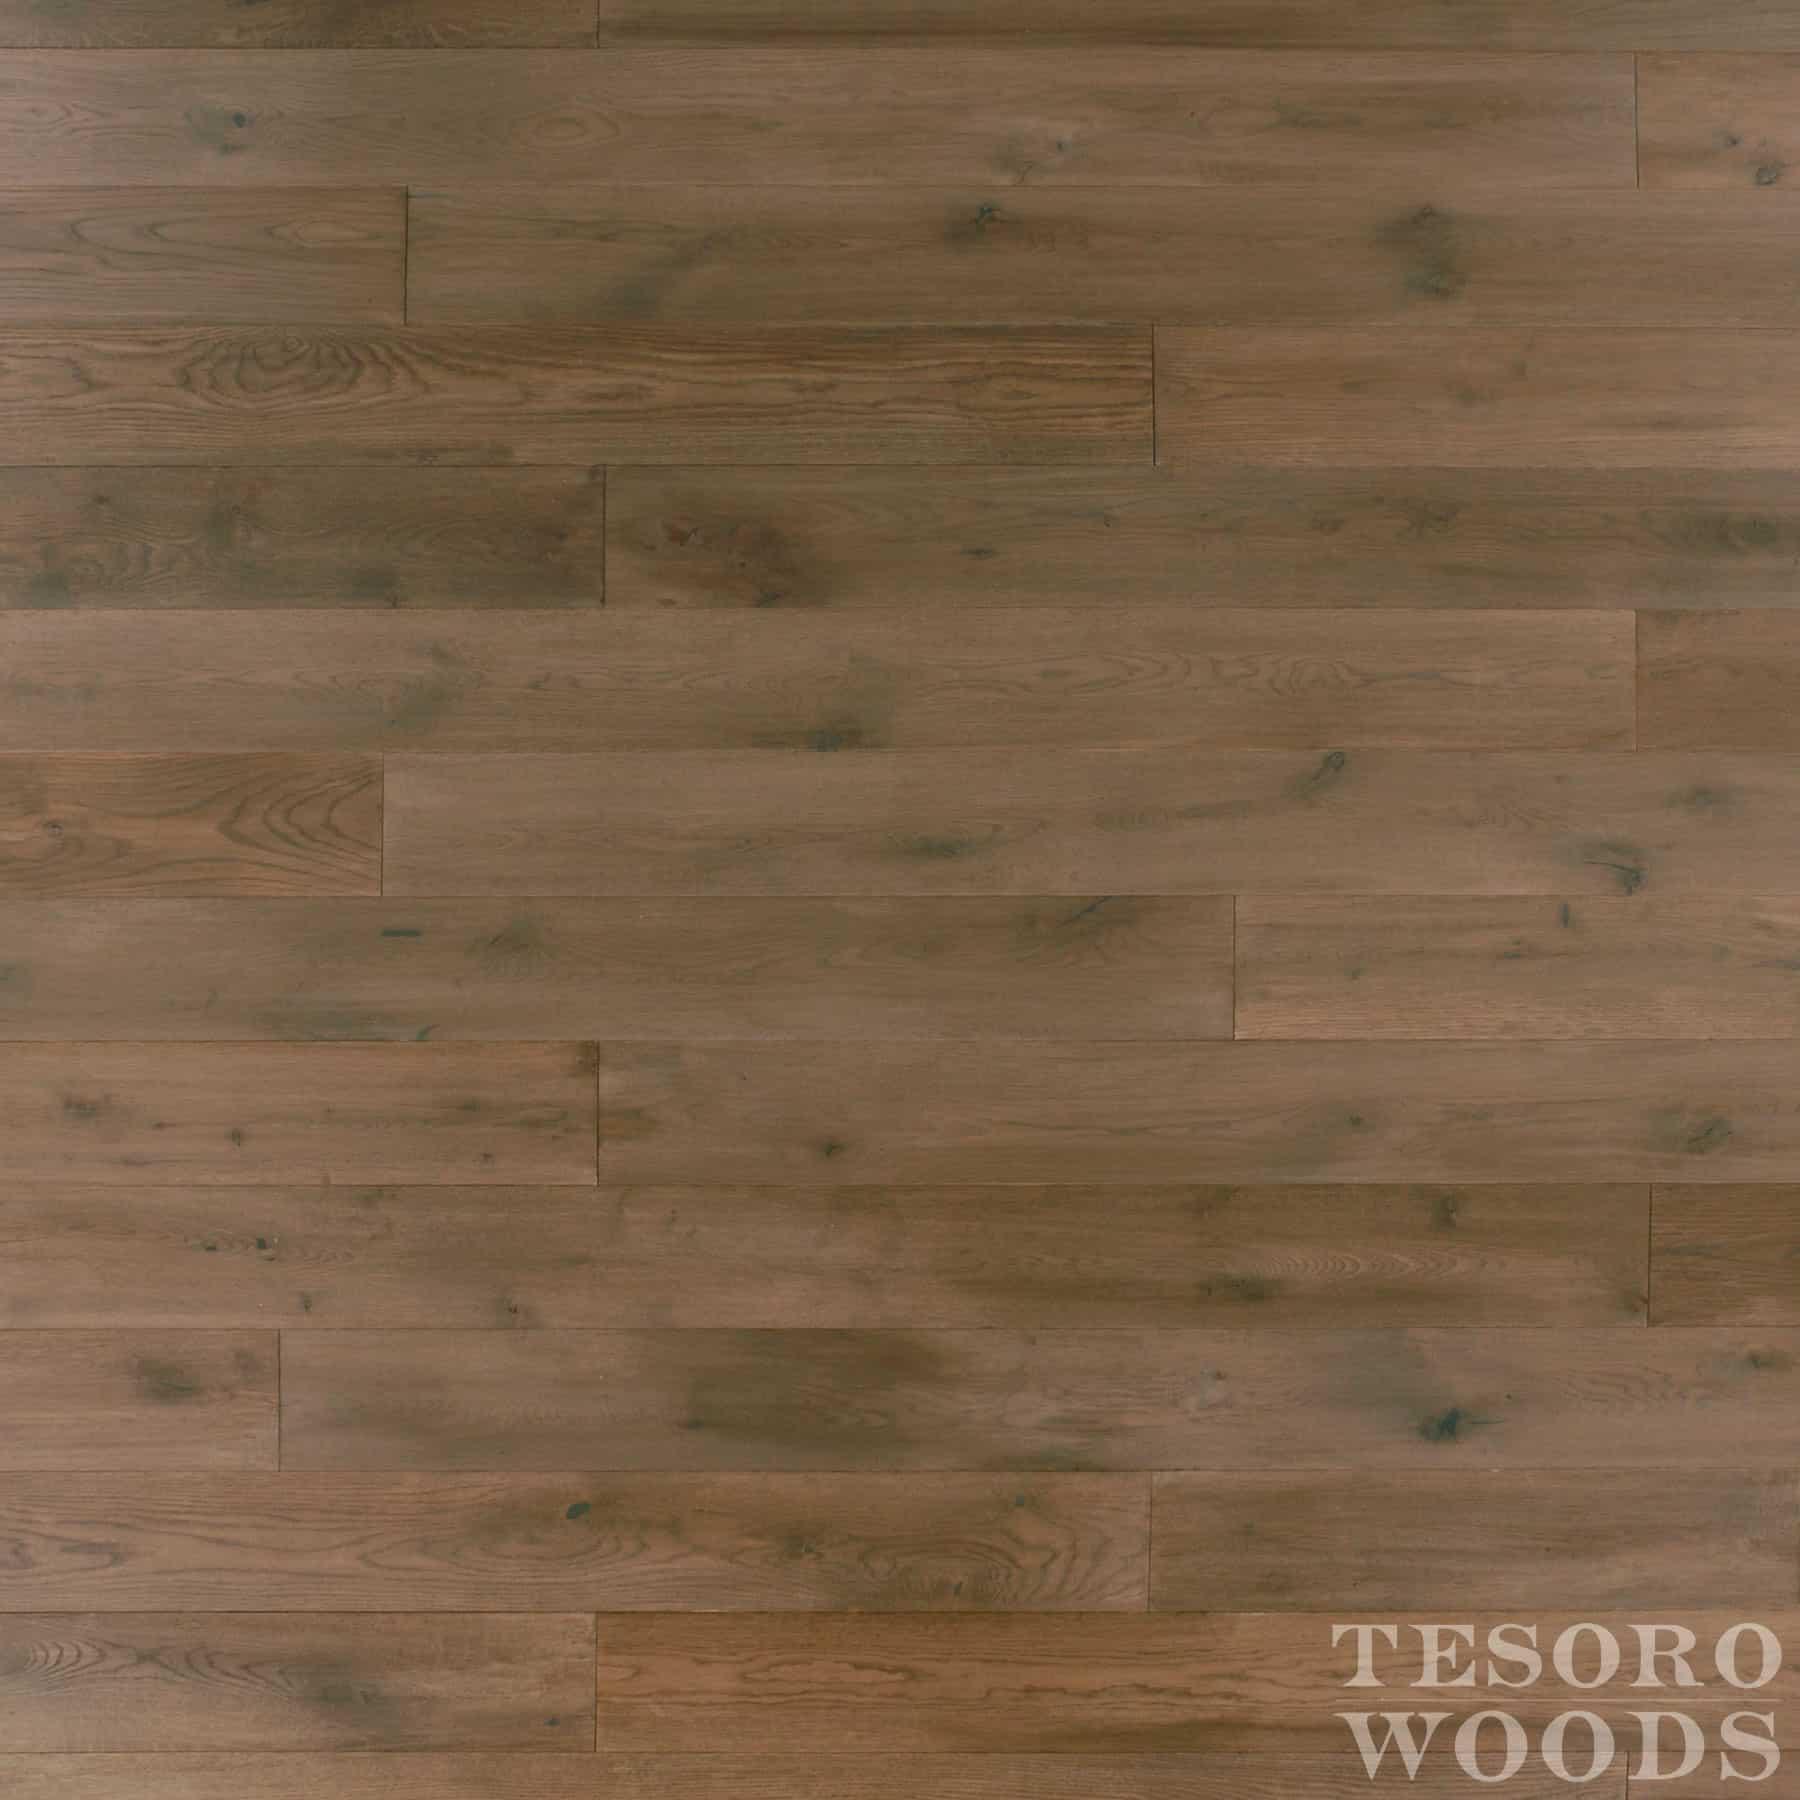 Tesoro Woods Sustainable White Oak Hardwood Flooring 7